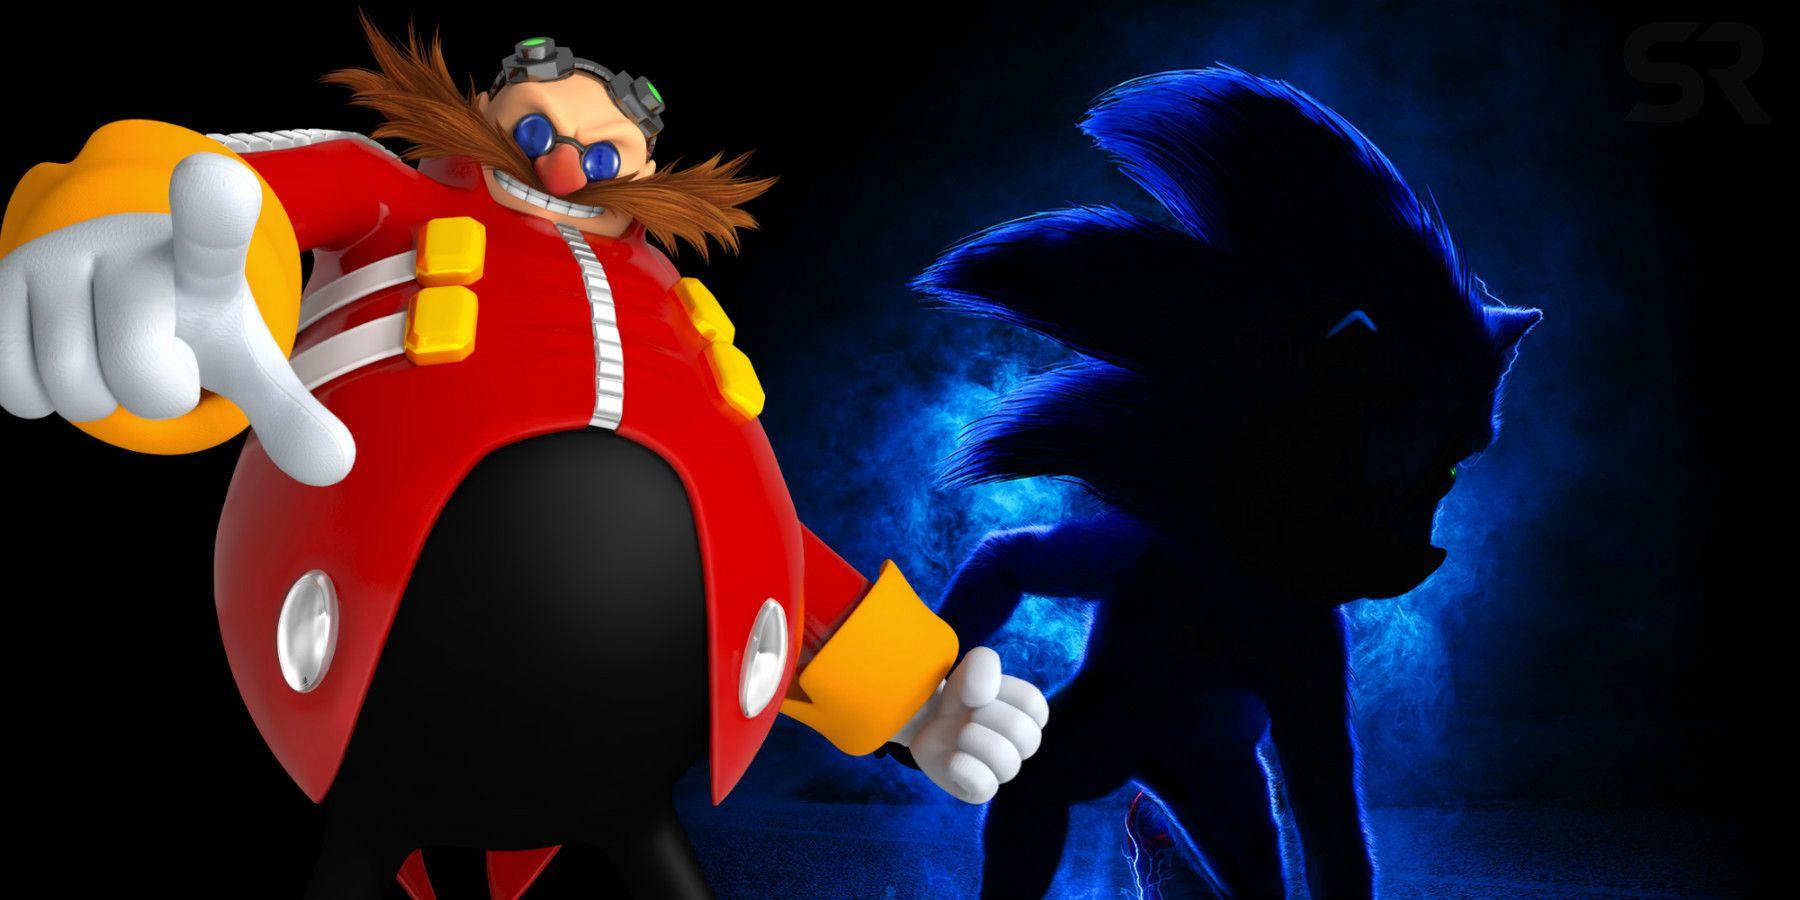 Sonic The Hedgehog Movie Cinemacon Footage Details Tease Robotnik